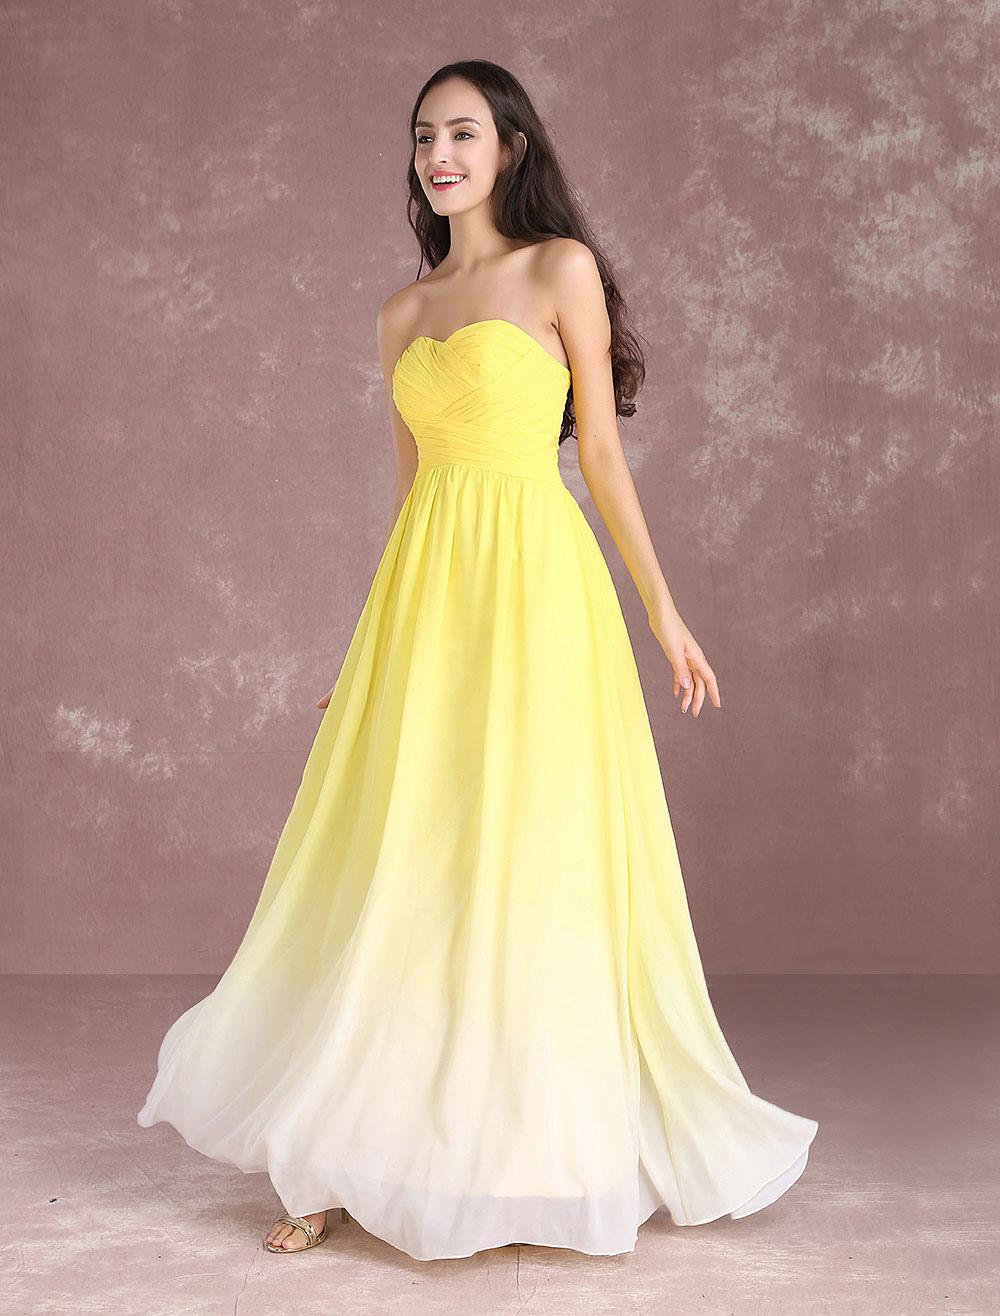 Long Bridesmaid Dress Chiffon Strapless Sweetheart Sleeveless Prom Dress Yellow Pleated Floor Length Party Dress